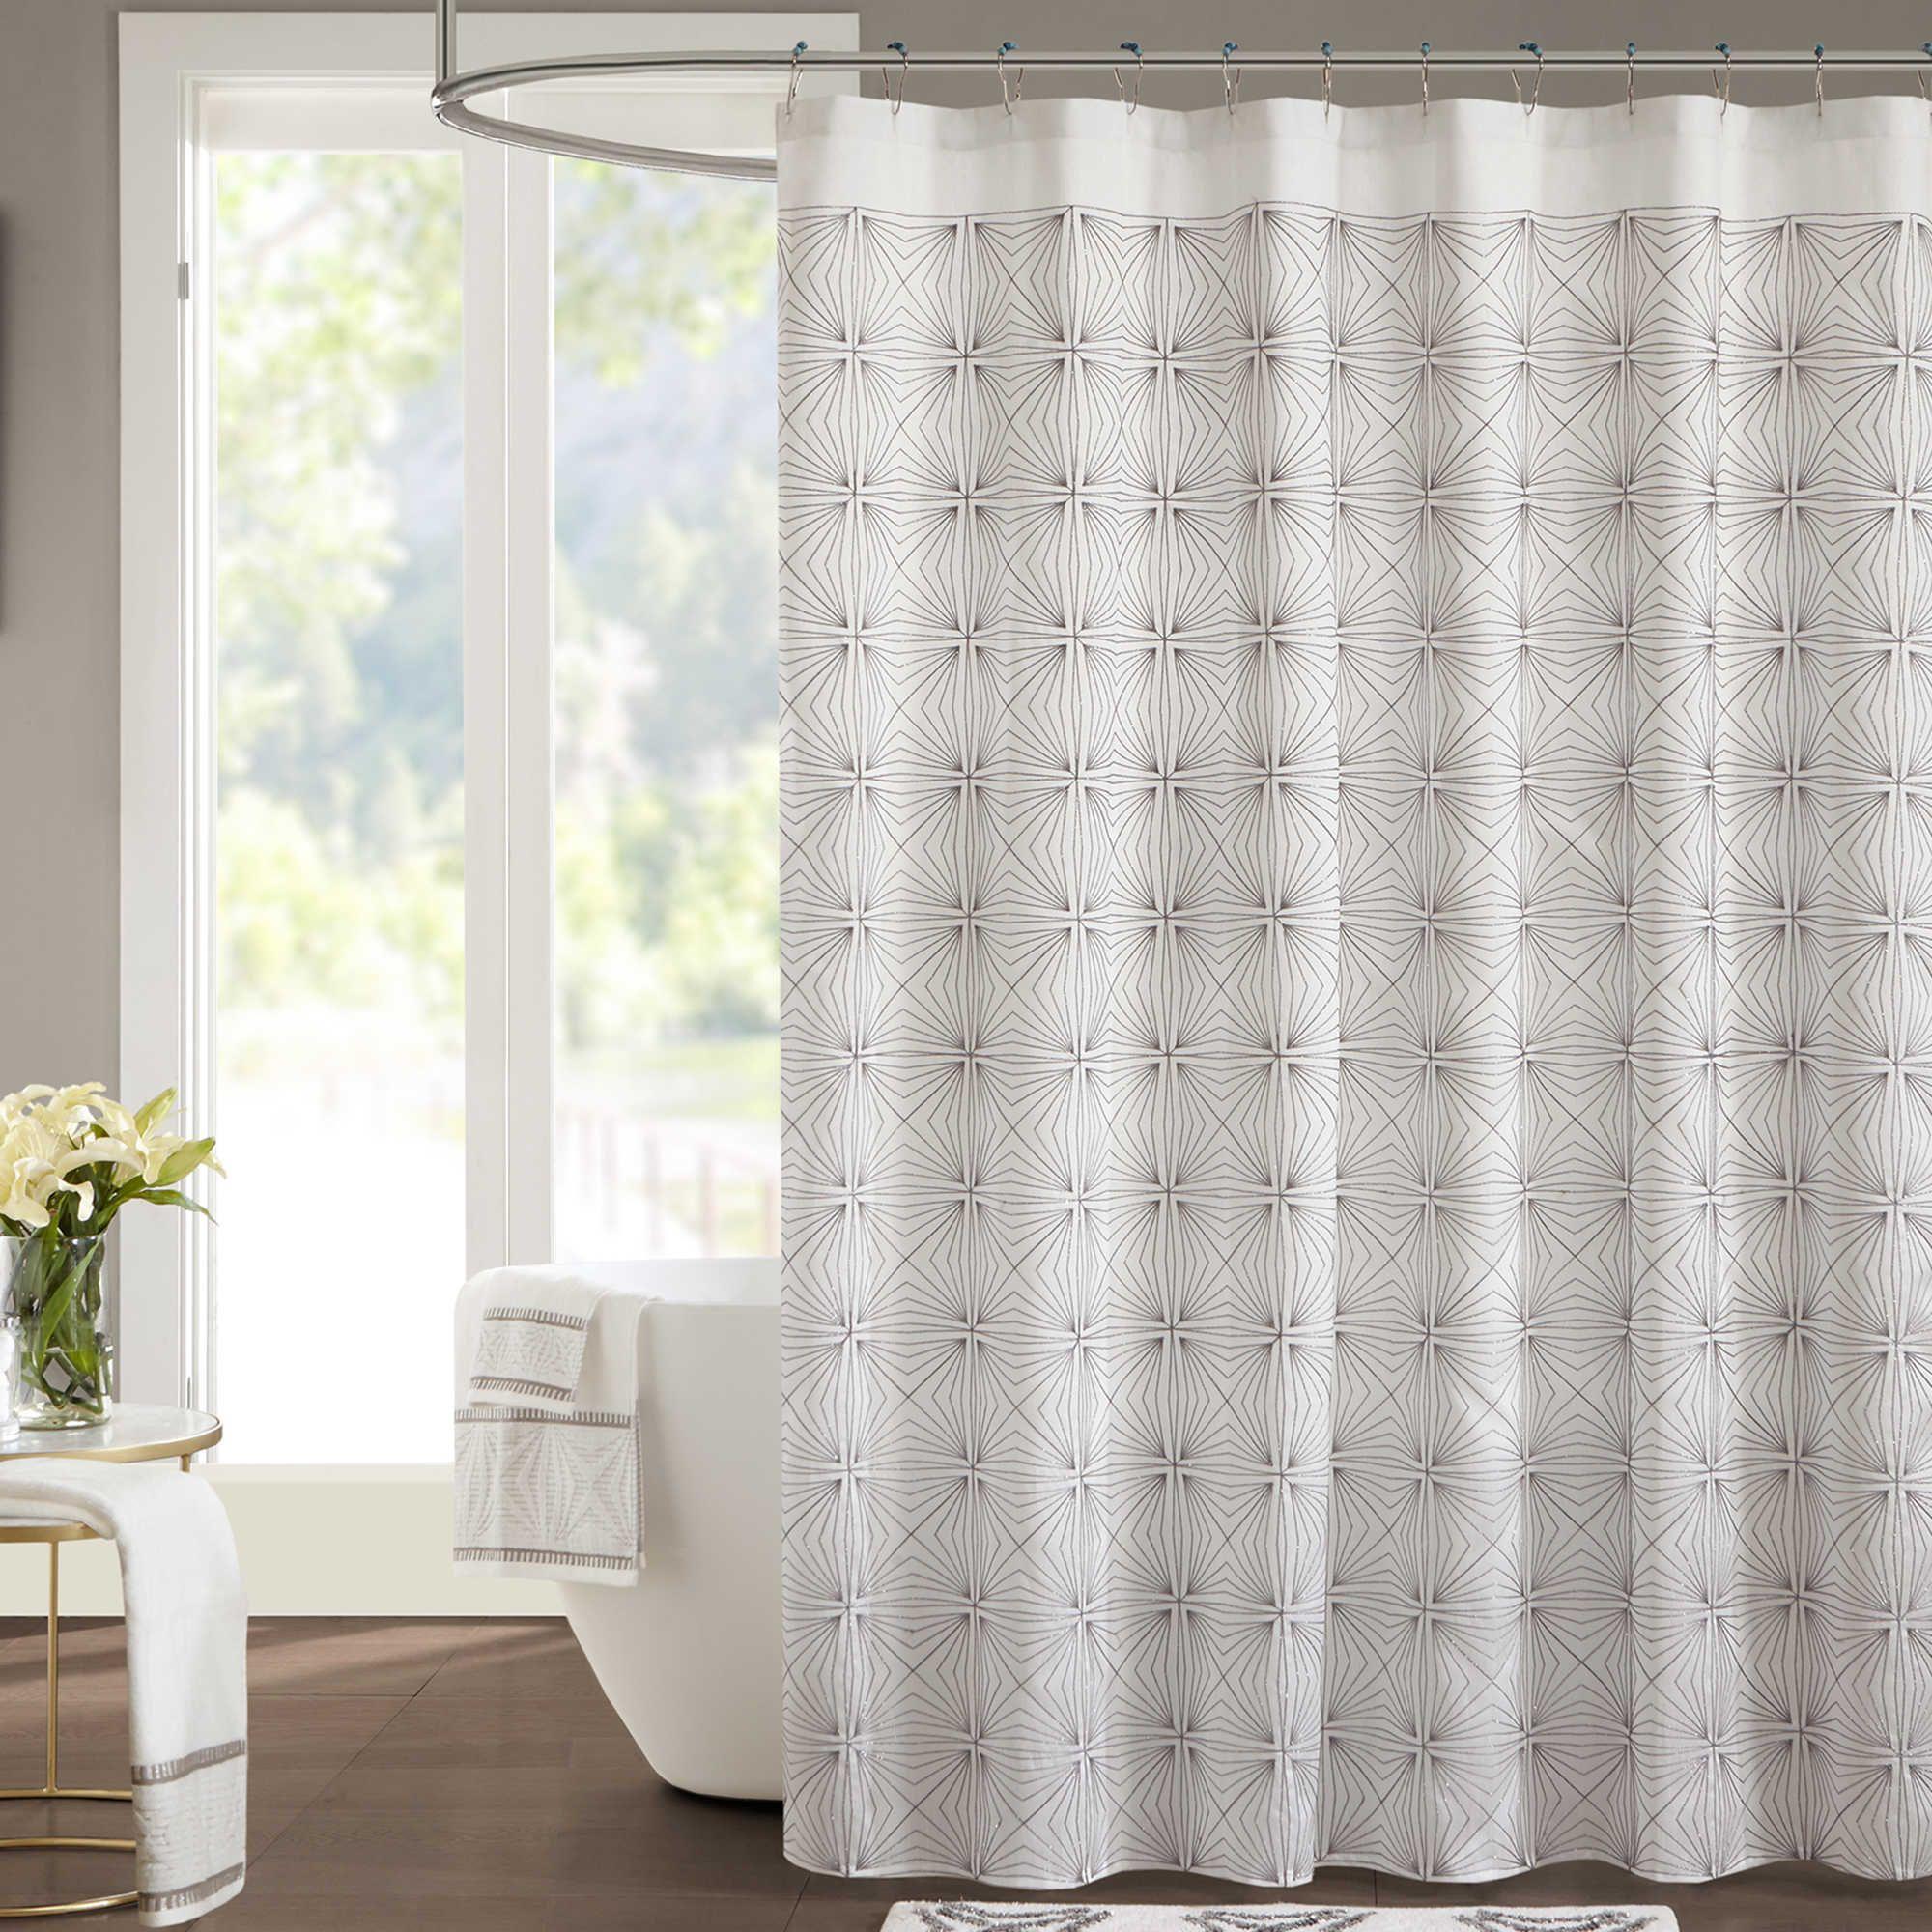 jla coty shower curtain home pinterest 96 inch shower curtain 96 inch shower curtain